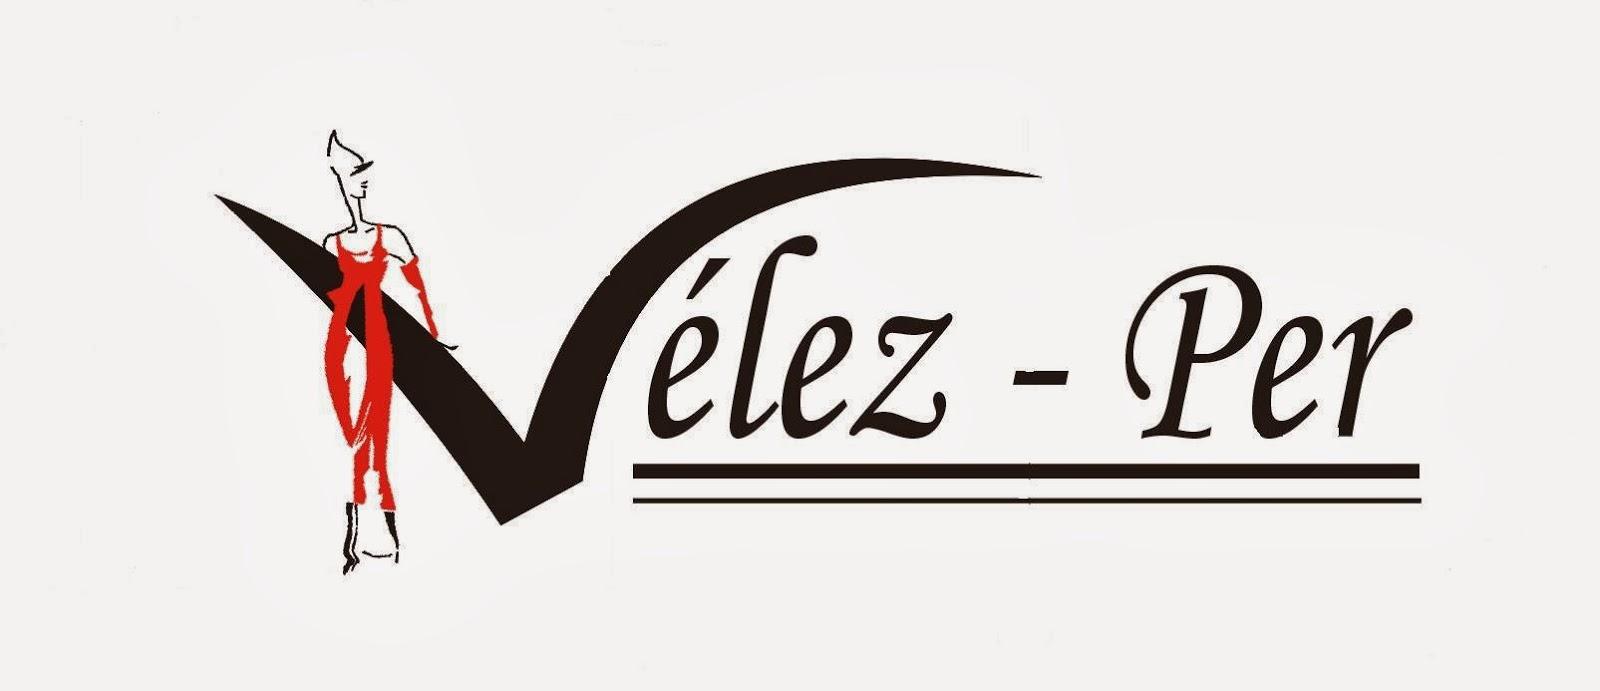 Escuela Velez-Per